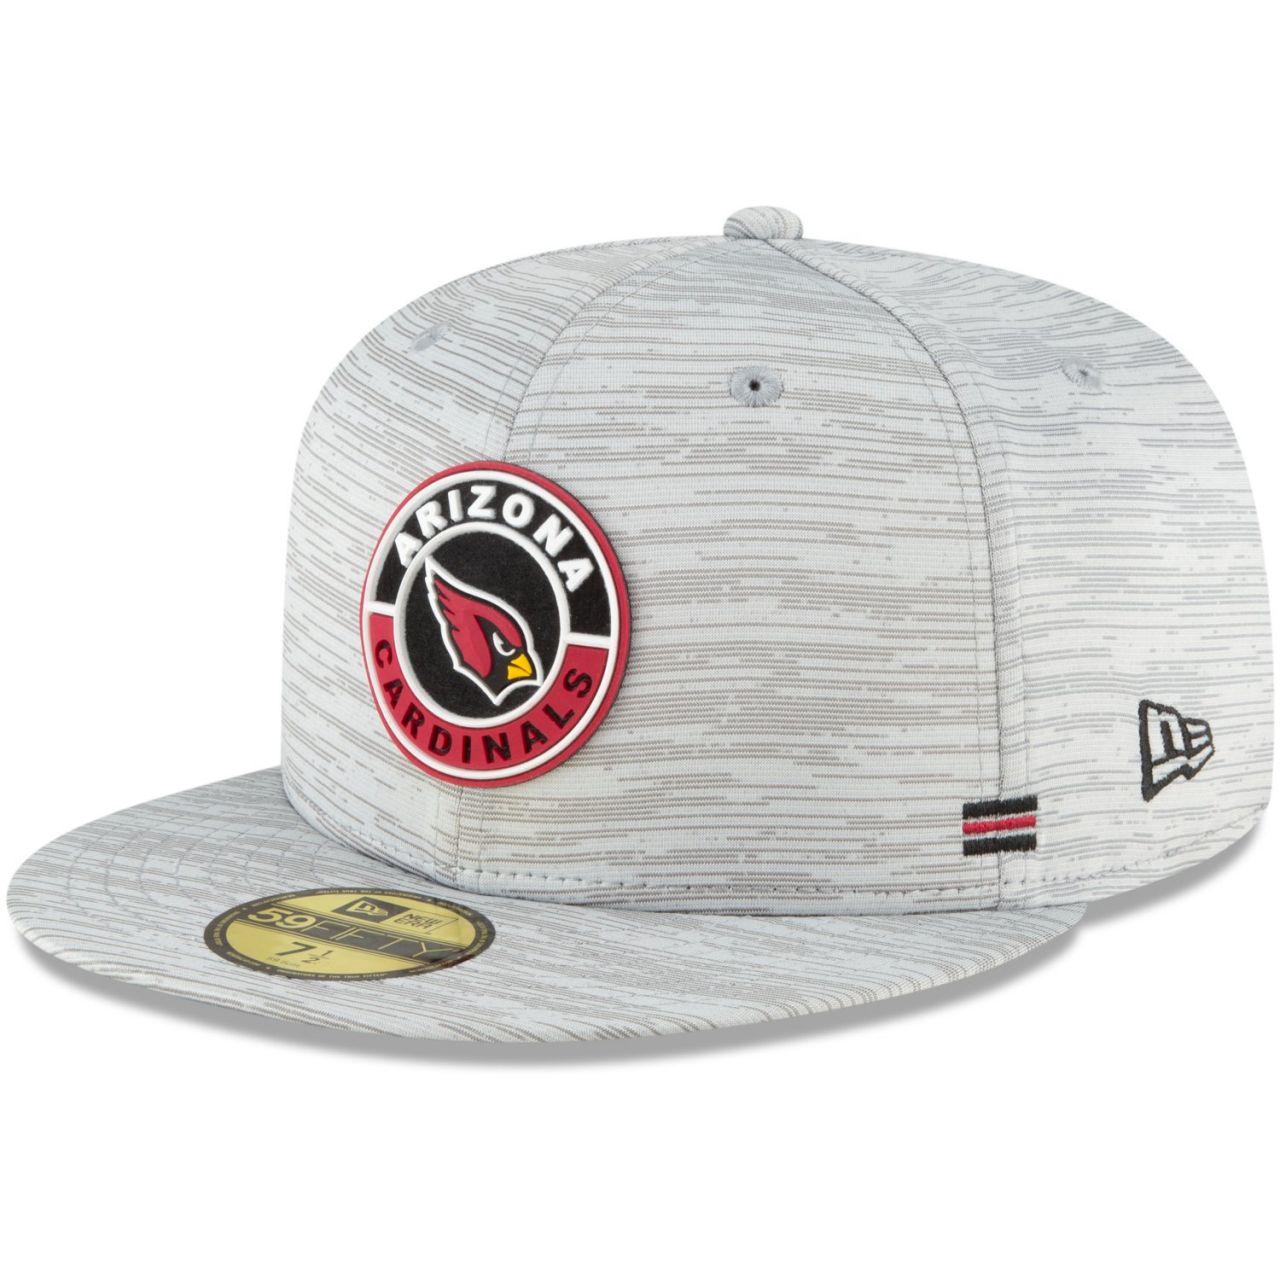 amfoo - New Era 59Fifty Fitted Cap - SIDELINE 2020 Arizona Cardinals